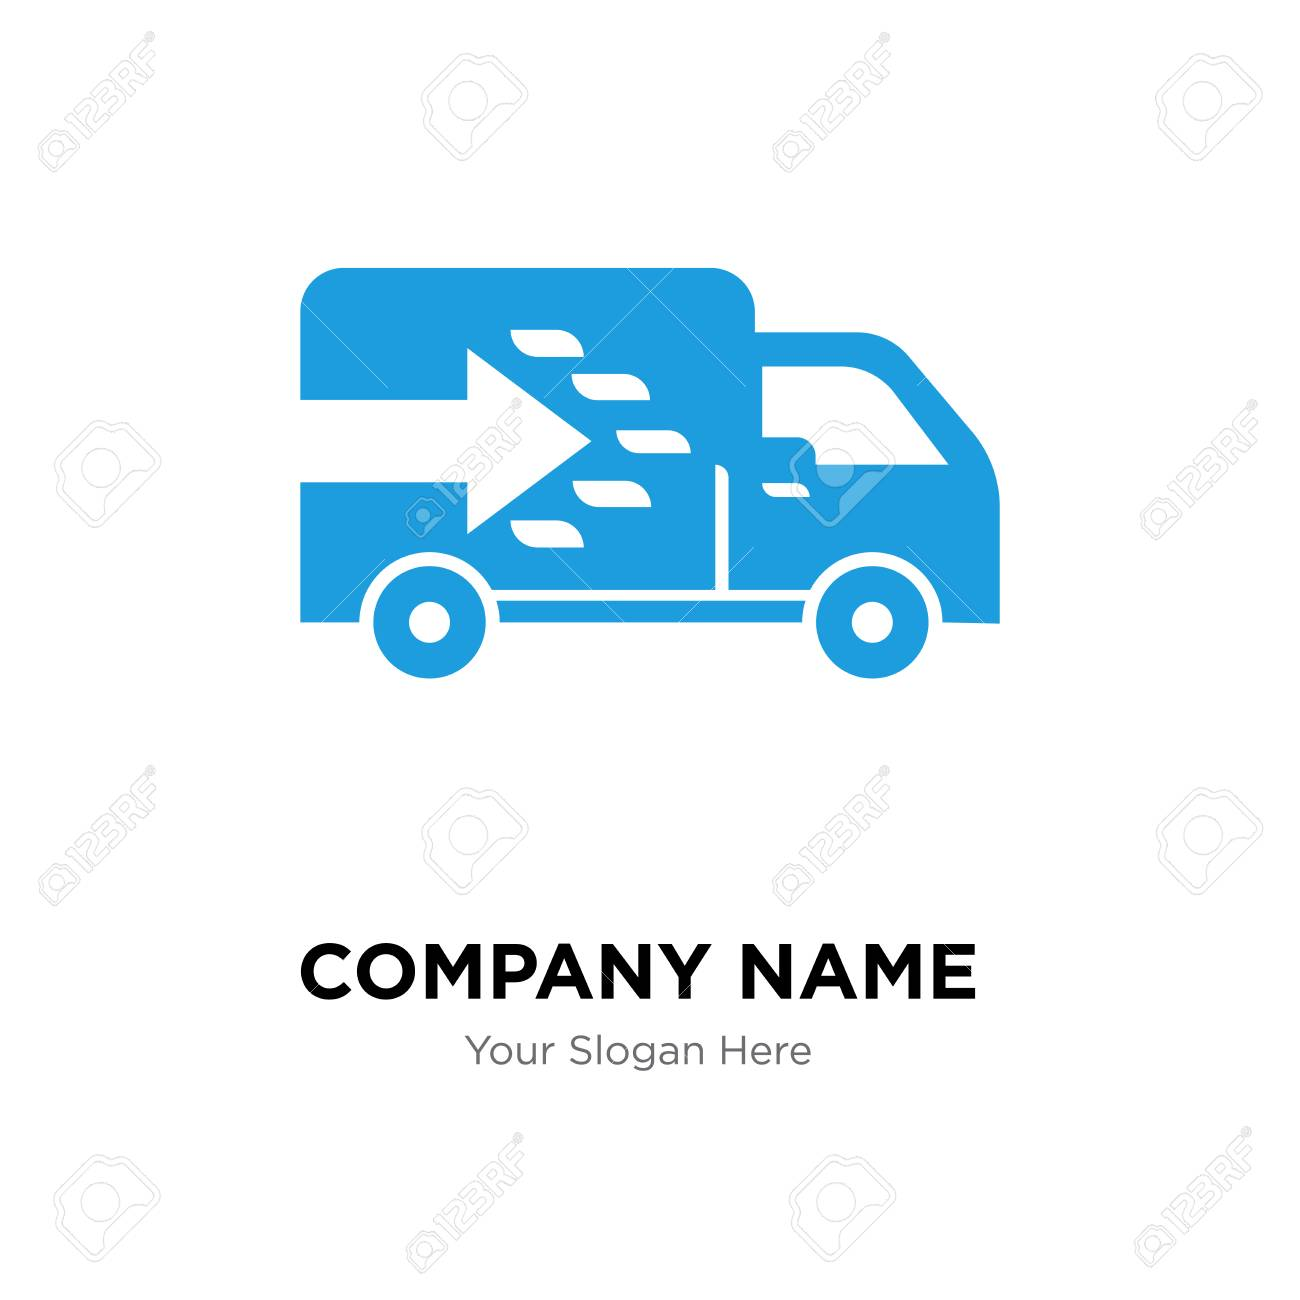 Logistics truck company logo design template, Business corporate